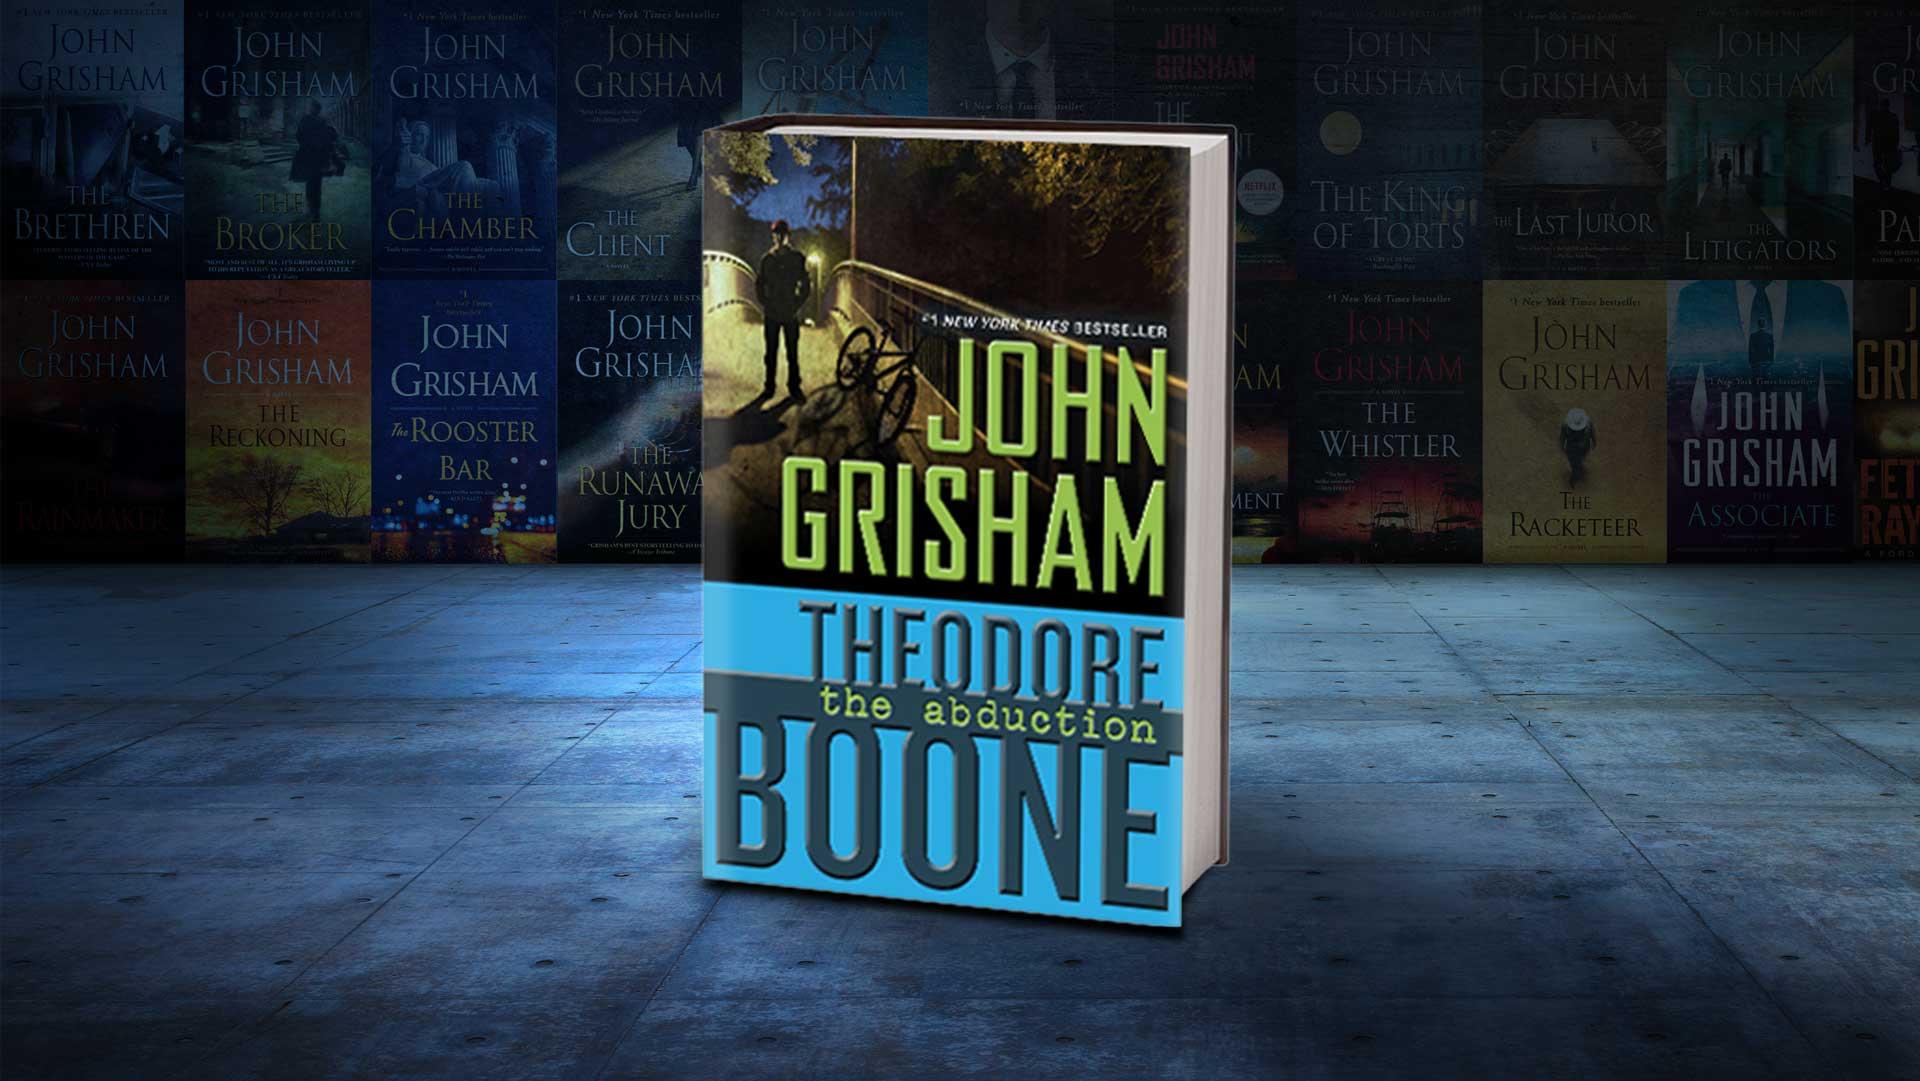 Theodore Boone: The Abduction - John Grisham